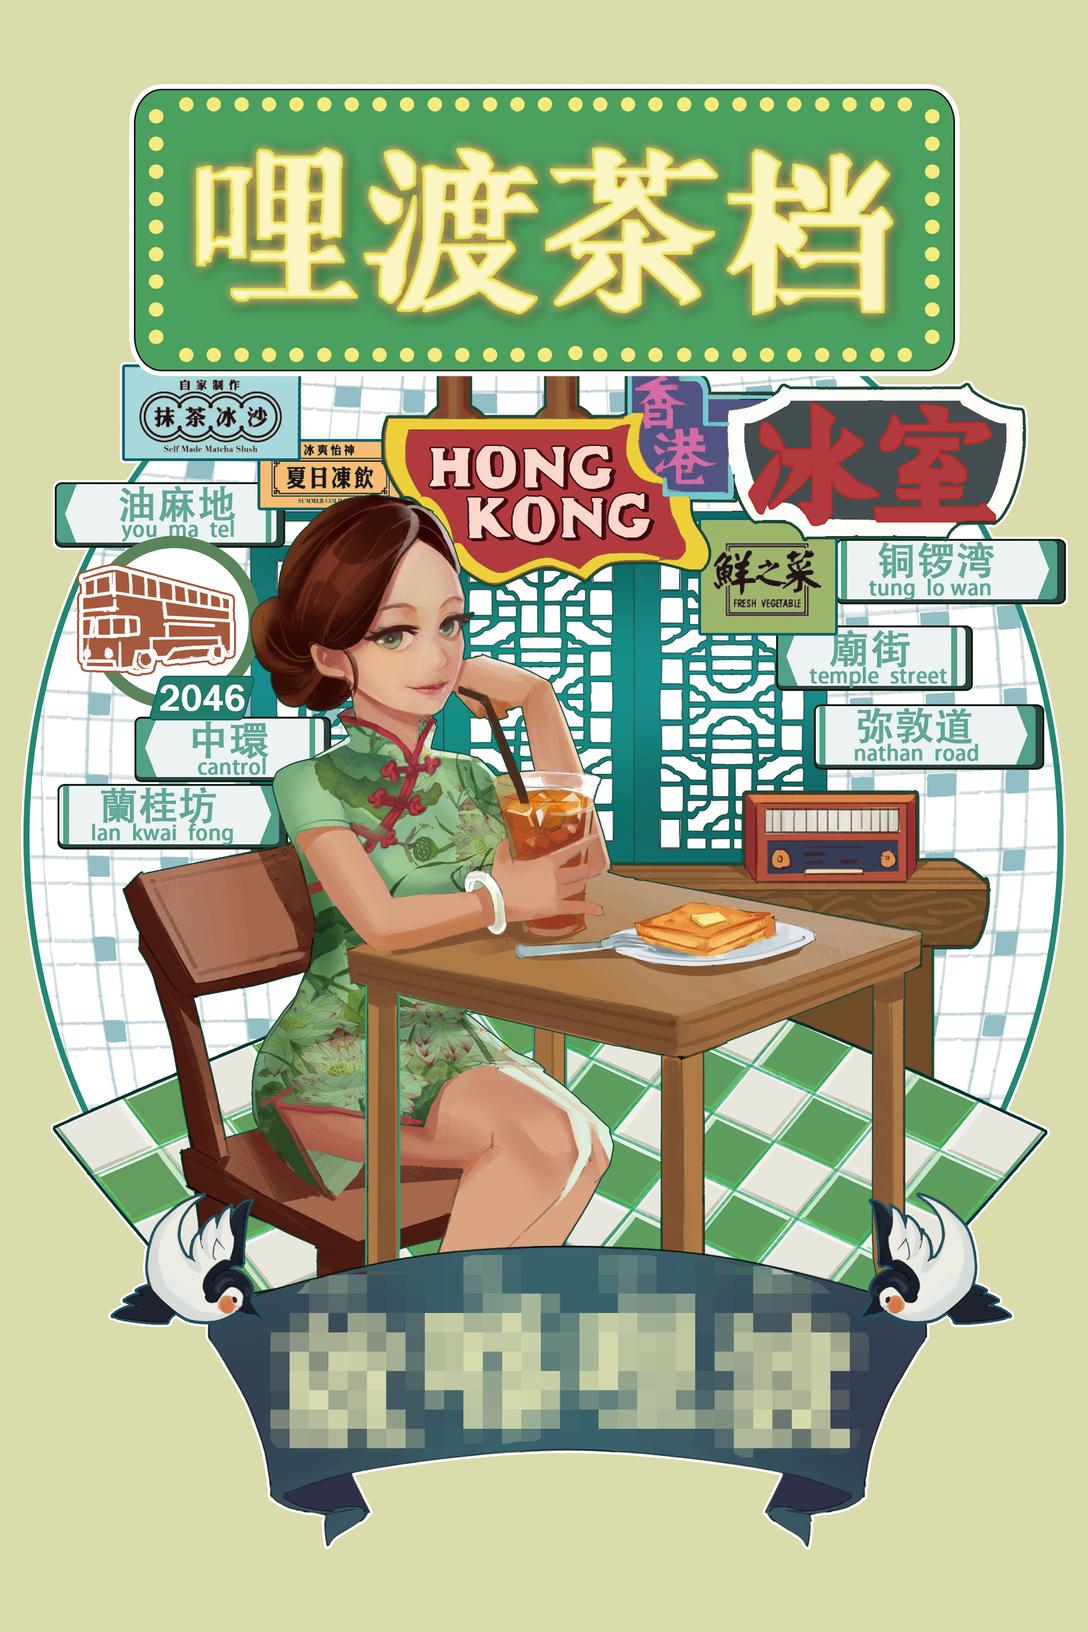 qq表情古田_茶餐厅手绘插画菜单设计-古田路9号-品牌创意/版权保护平台